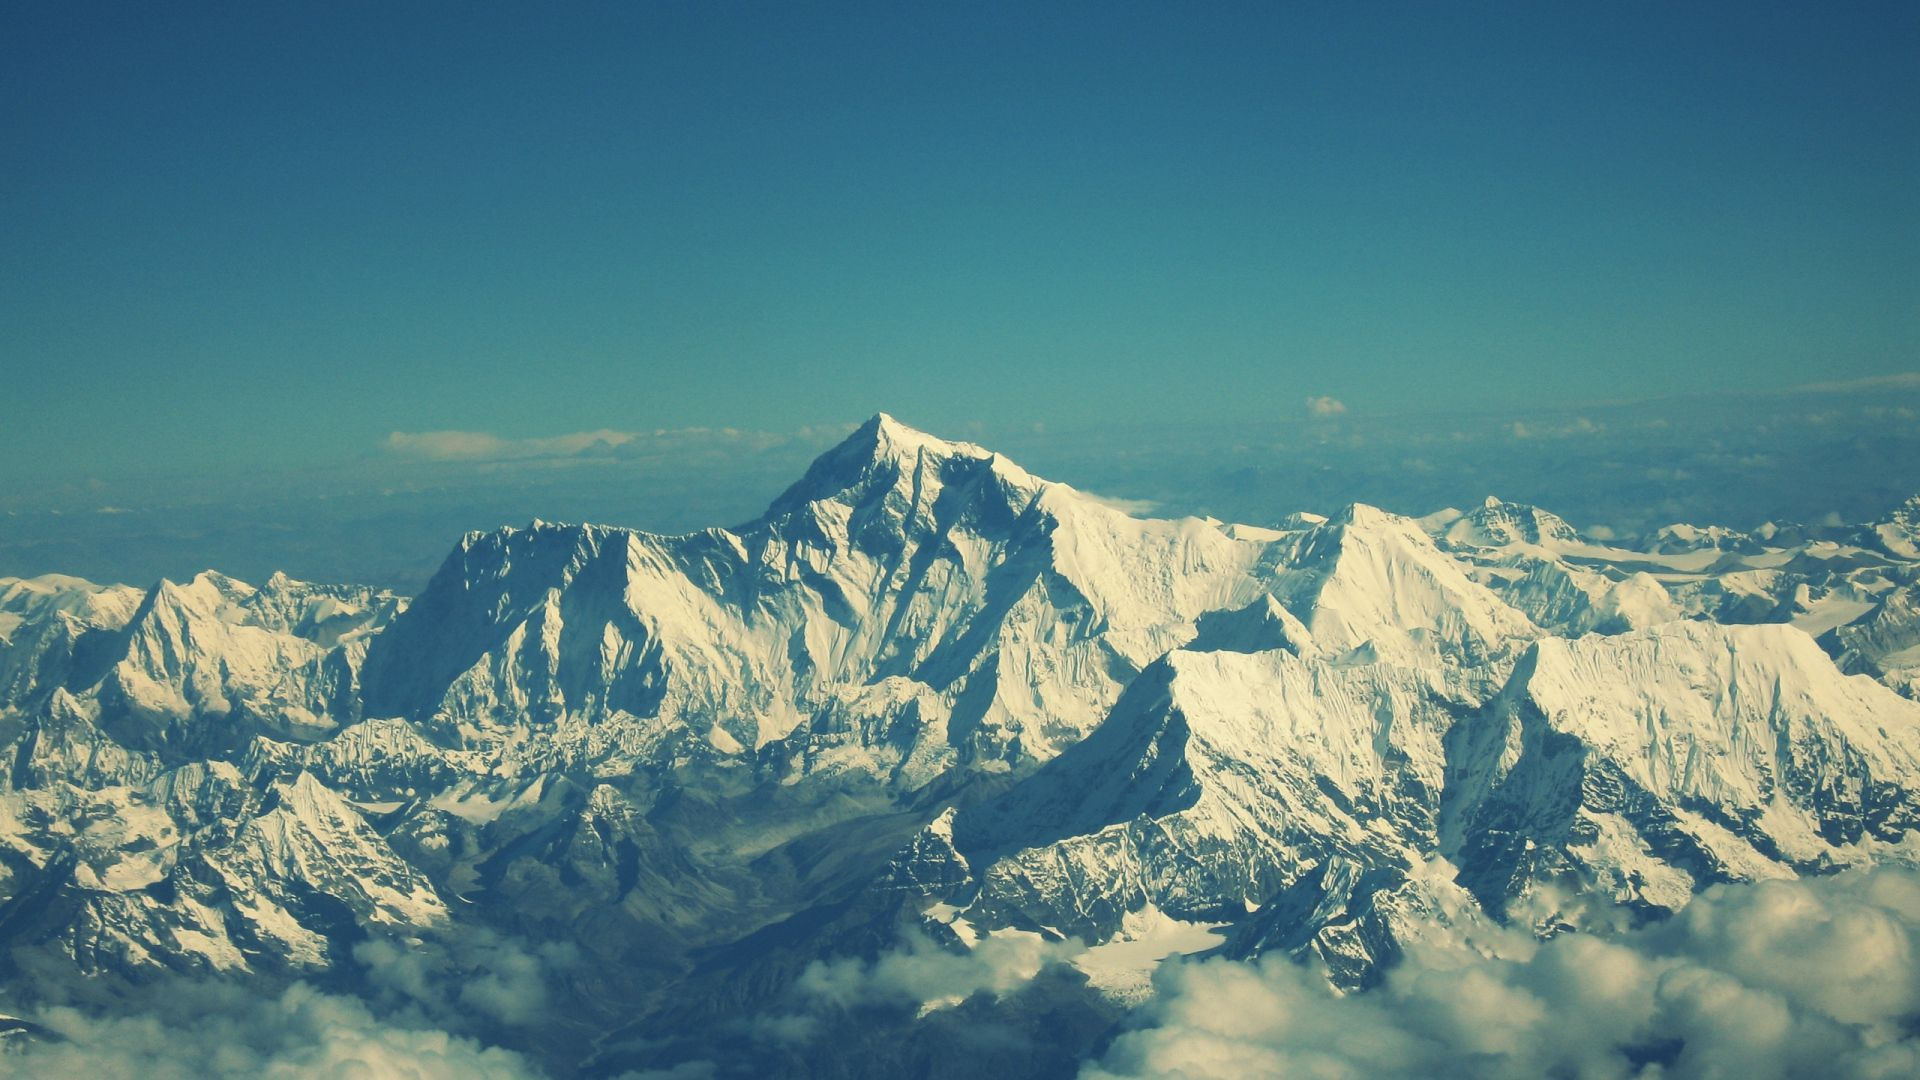 1920x1080 Wallpaper Everest Mountain Sky Tops Mountain